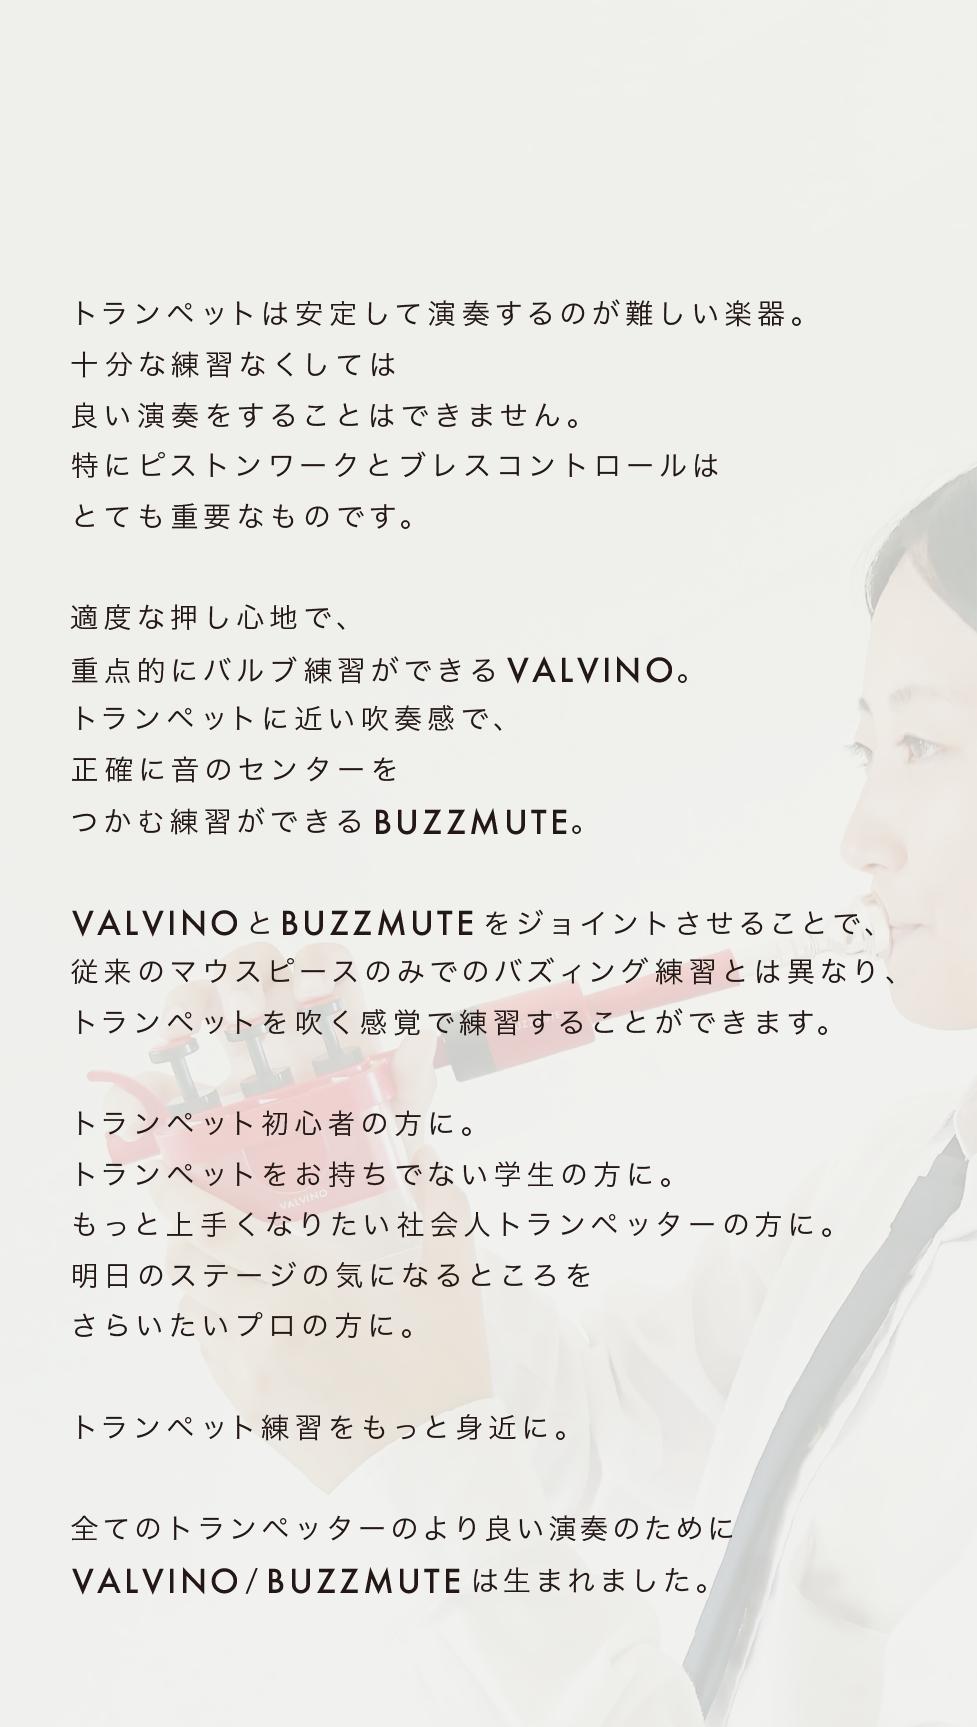 VALVINOコンセプト